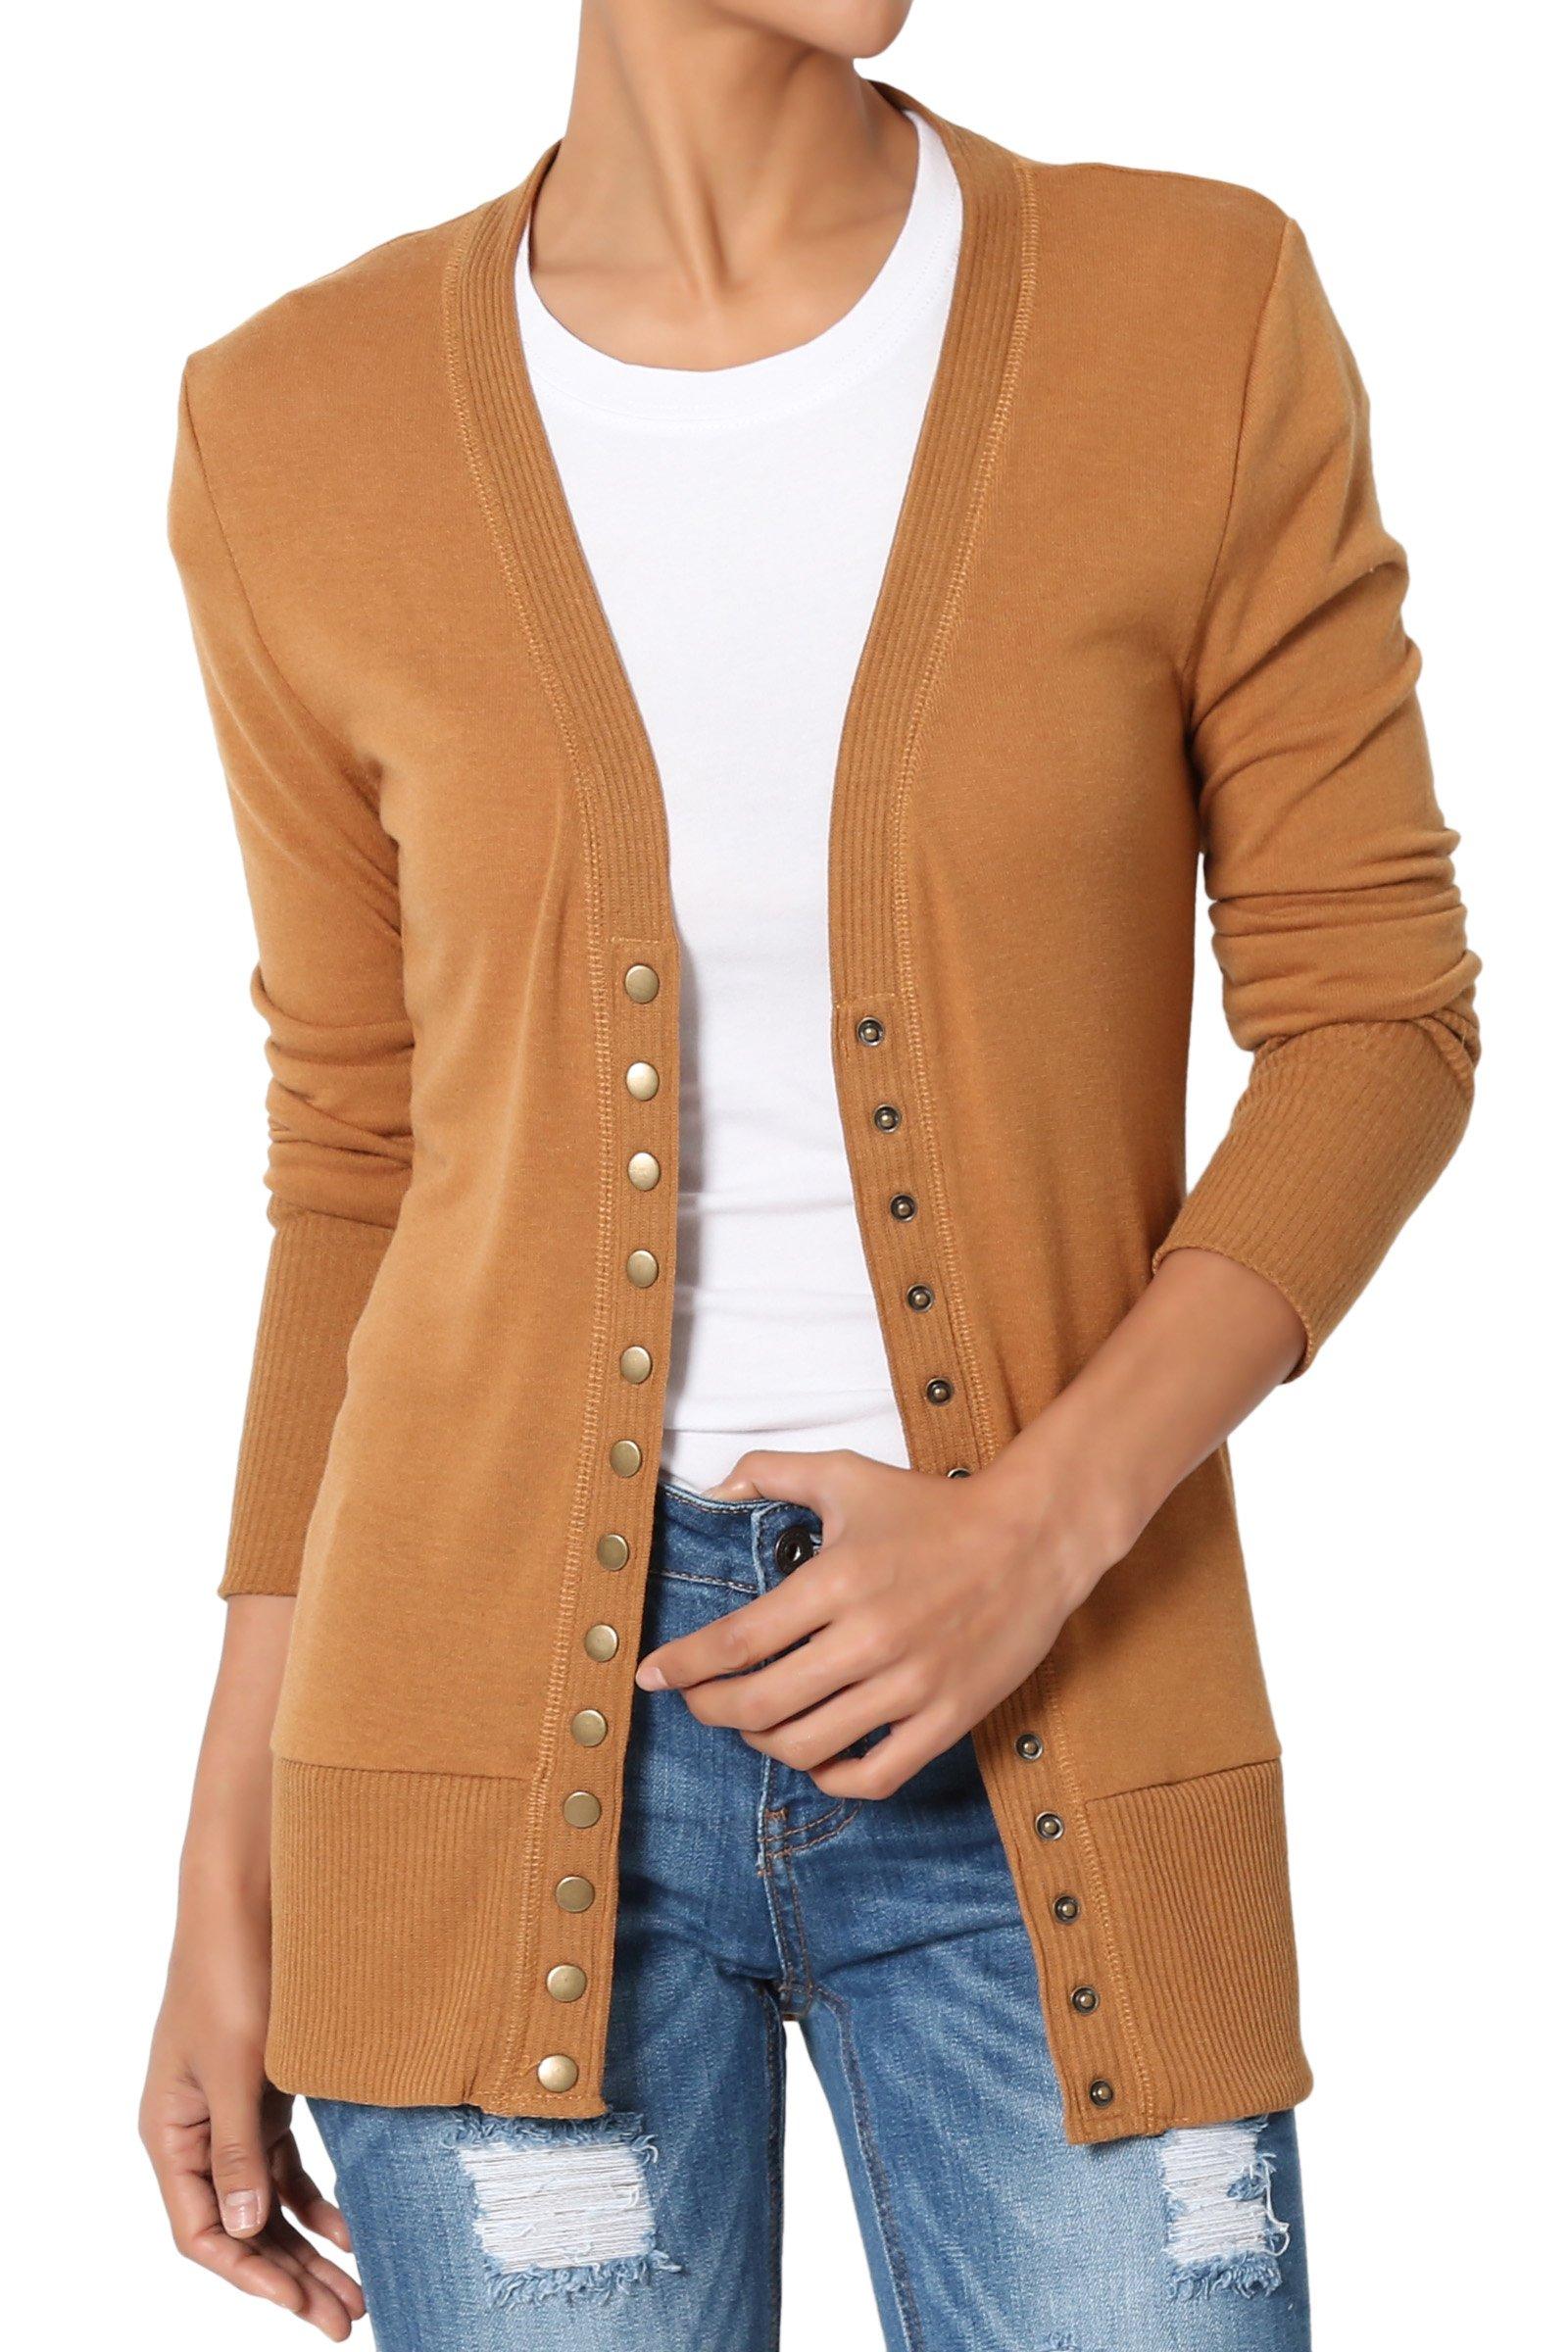 TheMogan Women's Snap Button V-Neck Long Sleeve Knit Cardigan Coffee L